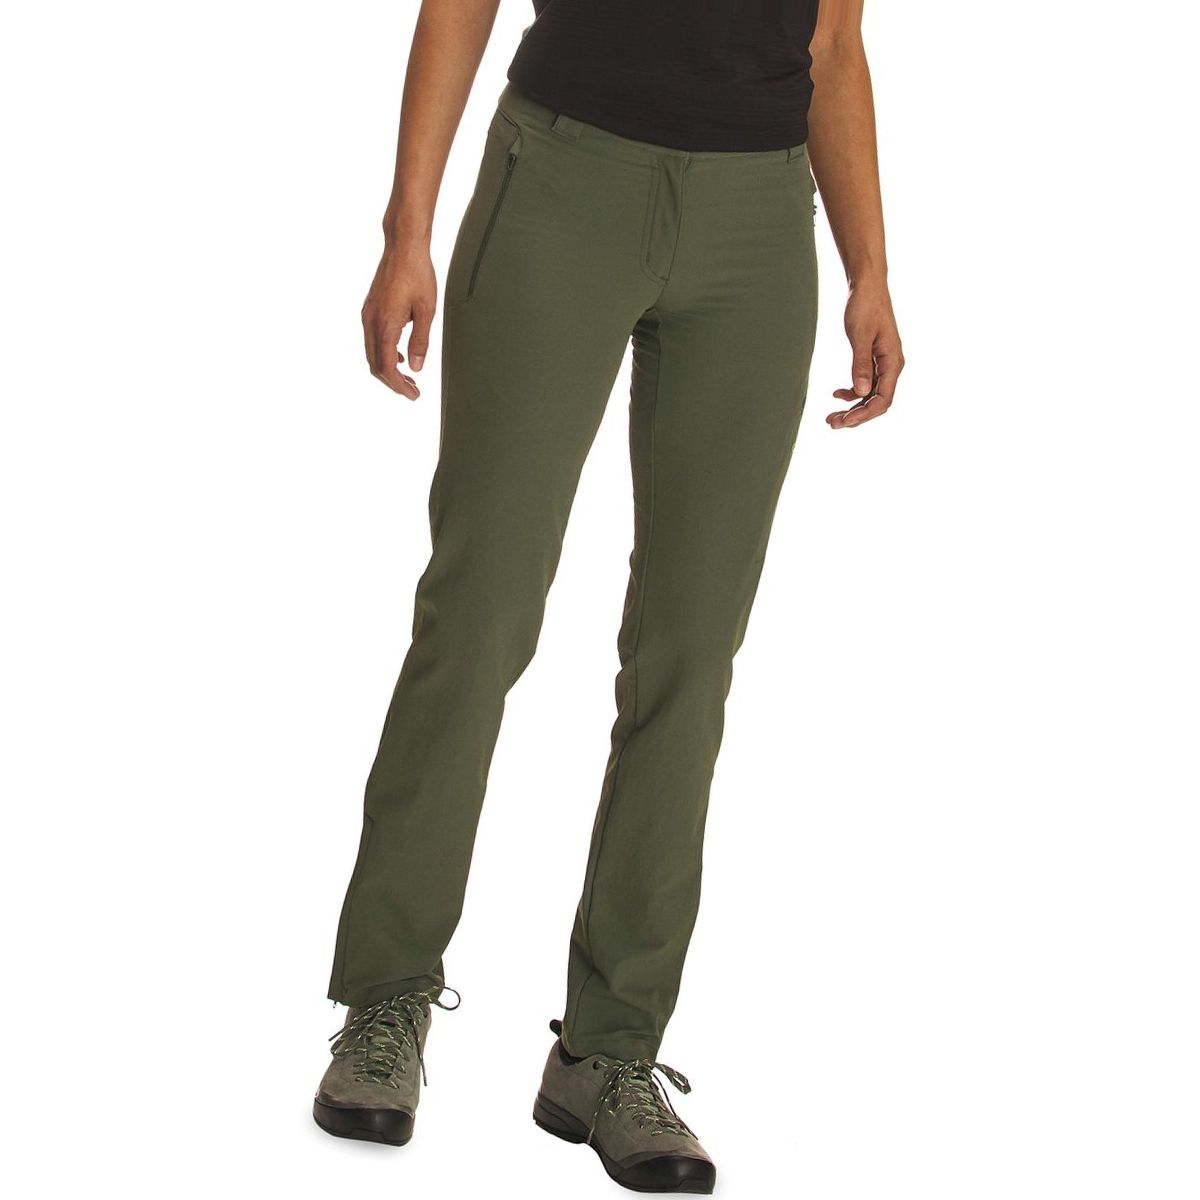 Marmot Scree Softshell Pant - Women's